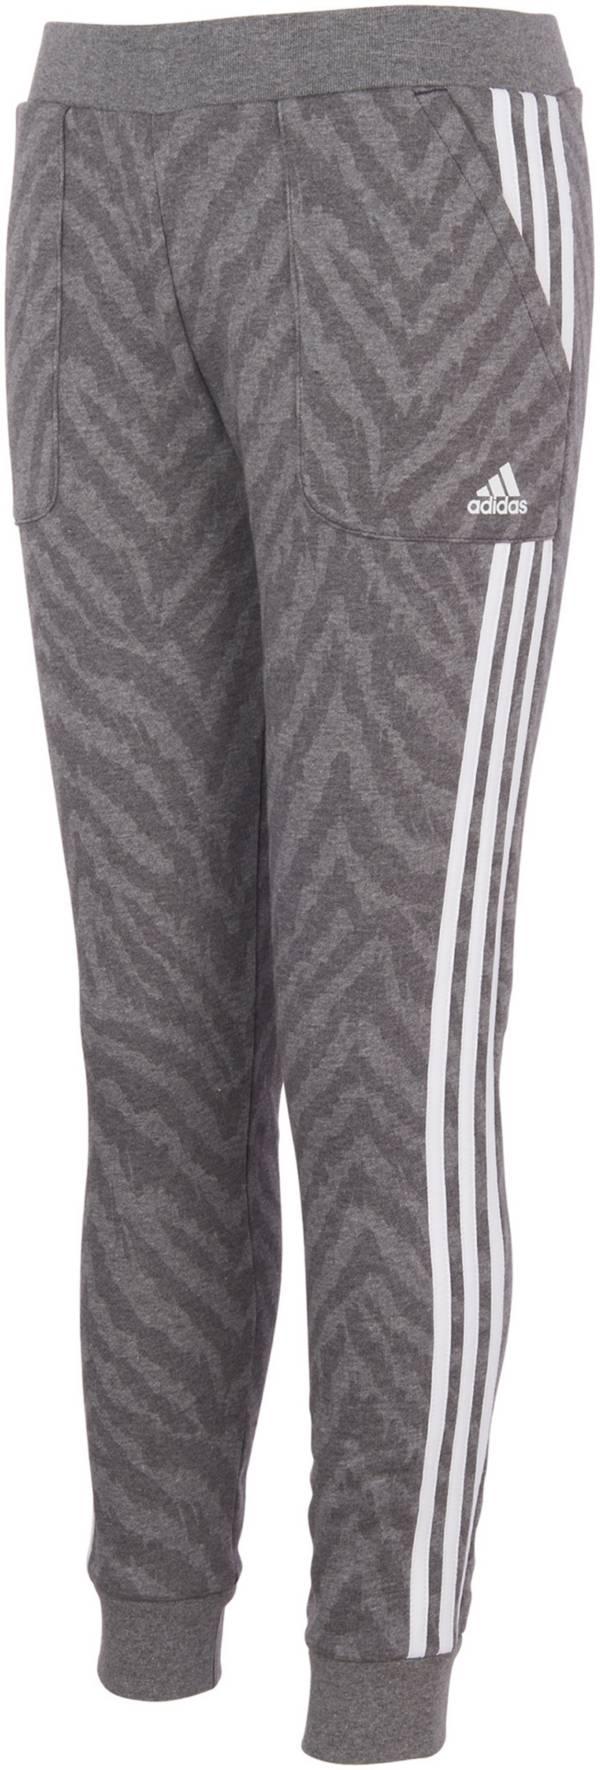 adidas Girls' AOP Fleece Jogger product image